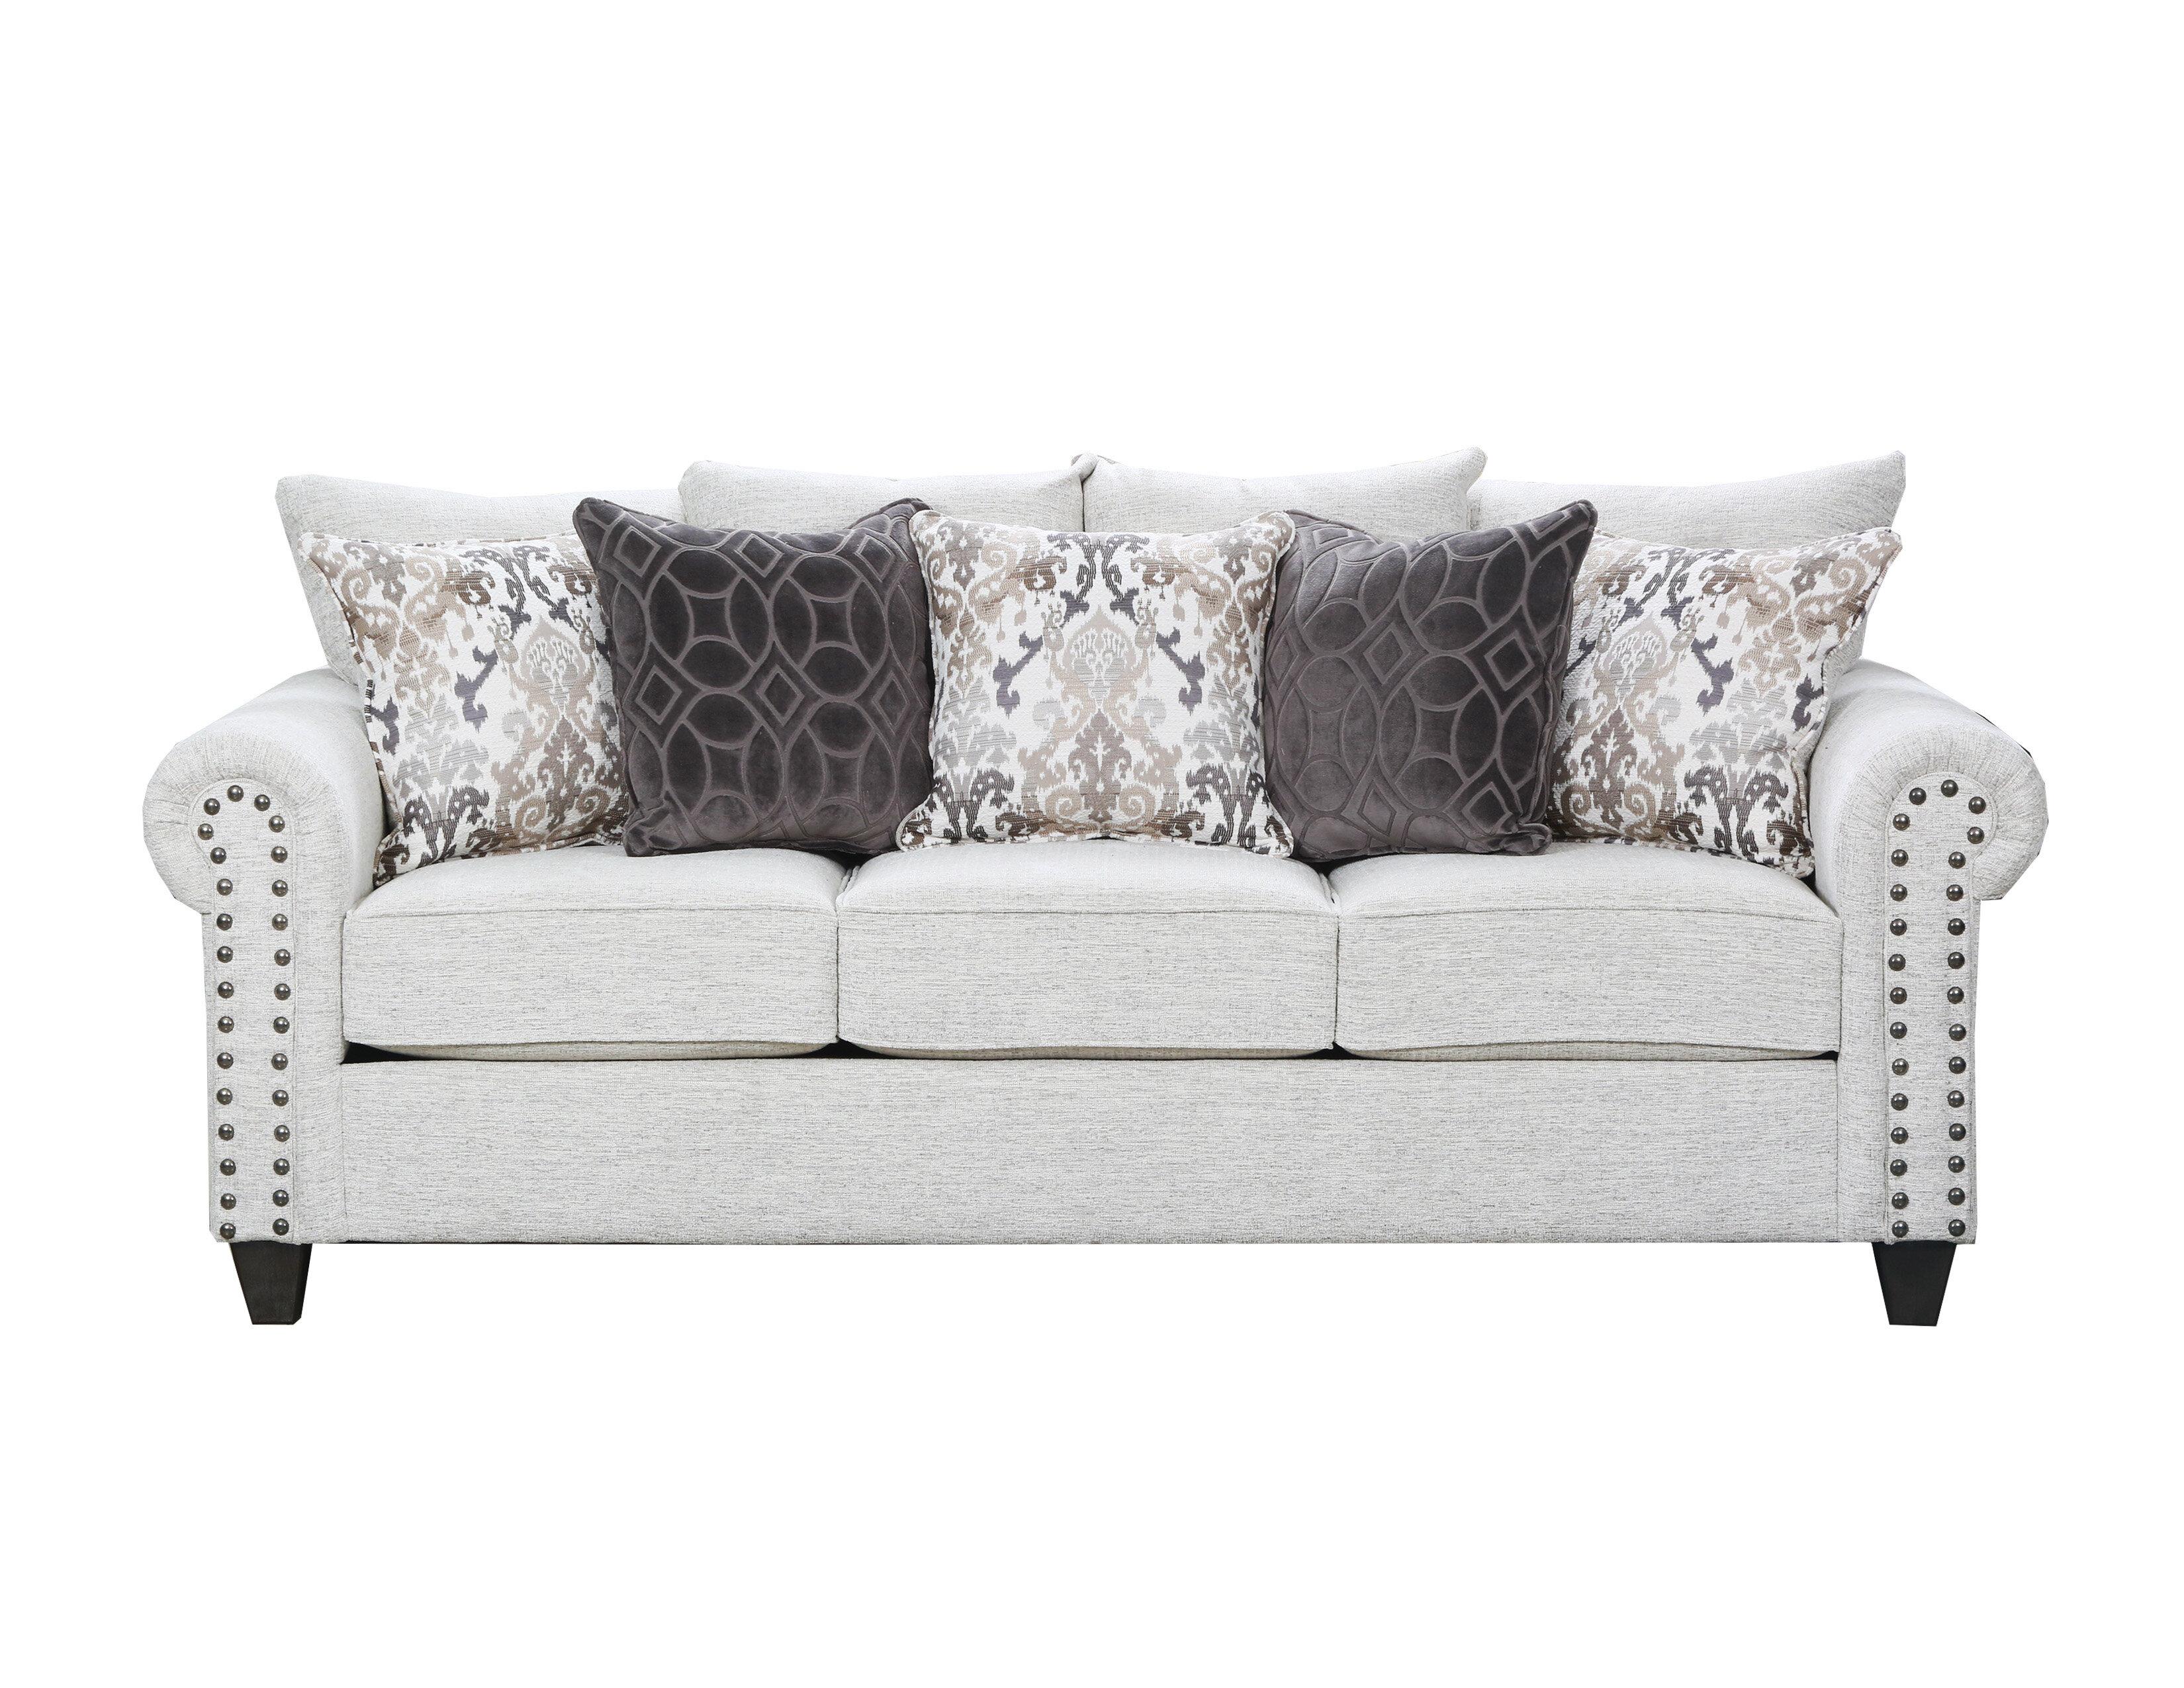 Enjoyable Simmons Upholstery Merseyside Sofa Pabps2019 Chair Design Images Pabps2019Com